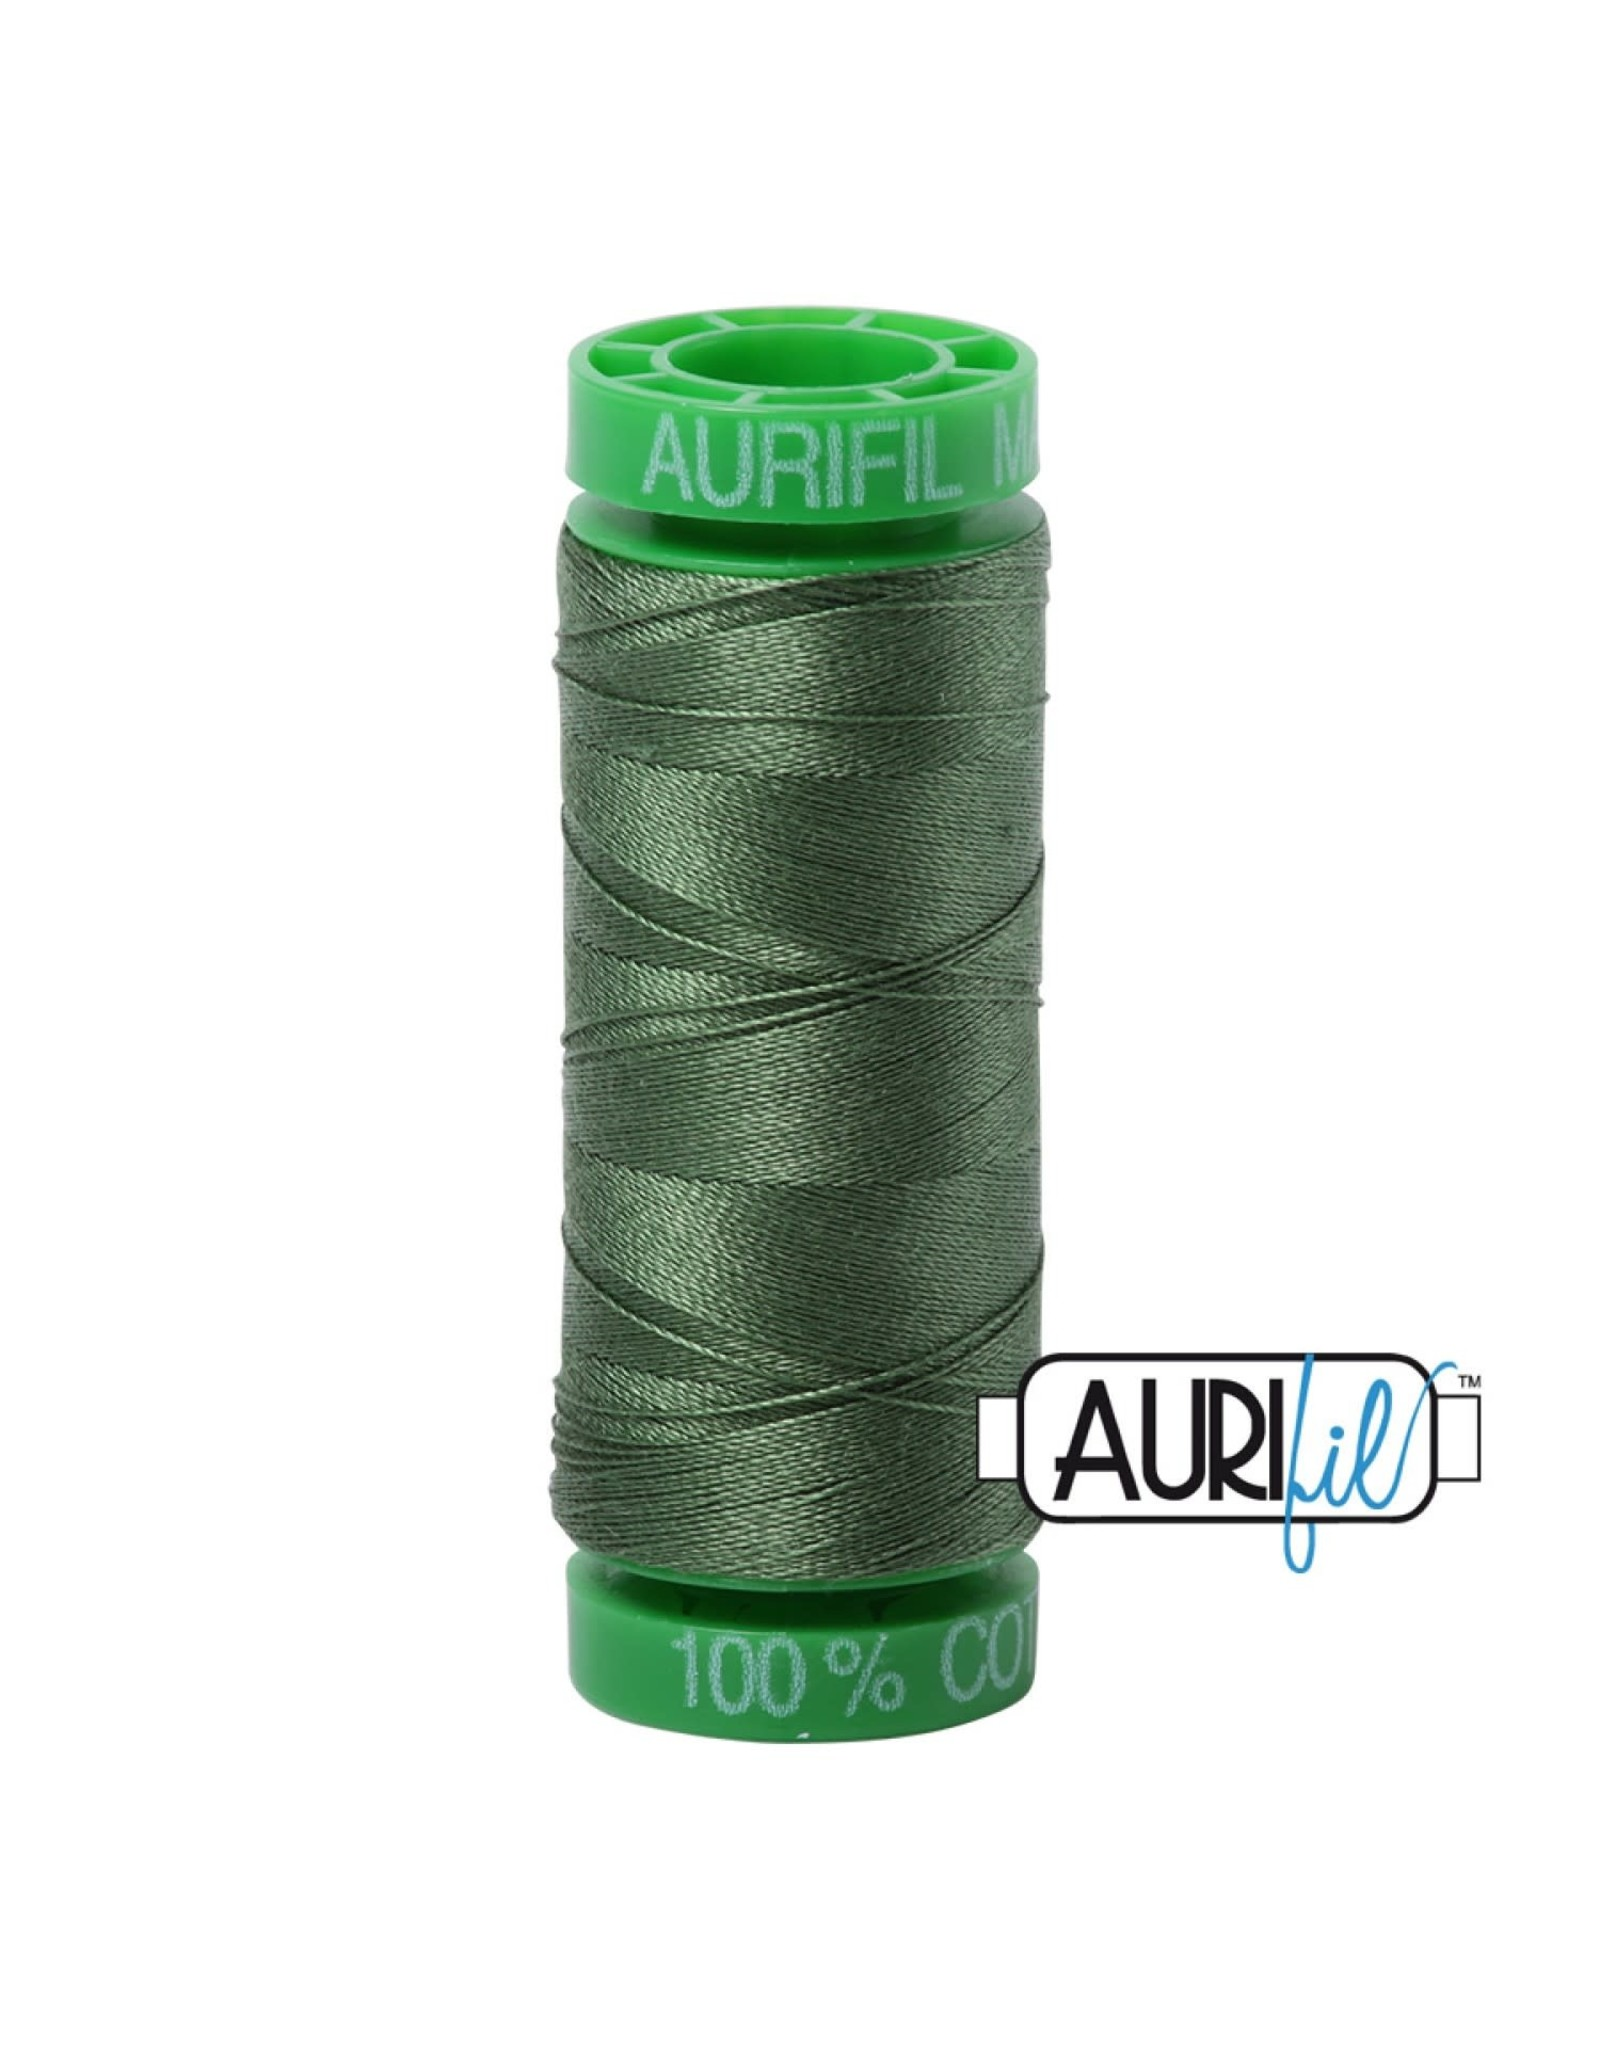 Aurifil Mako 40 - 150 m 2890 - Very Dark Grass Green